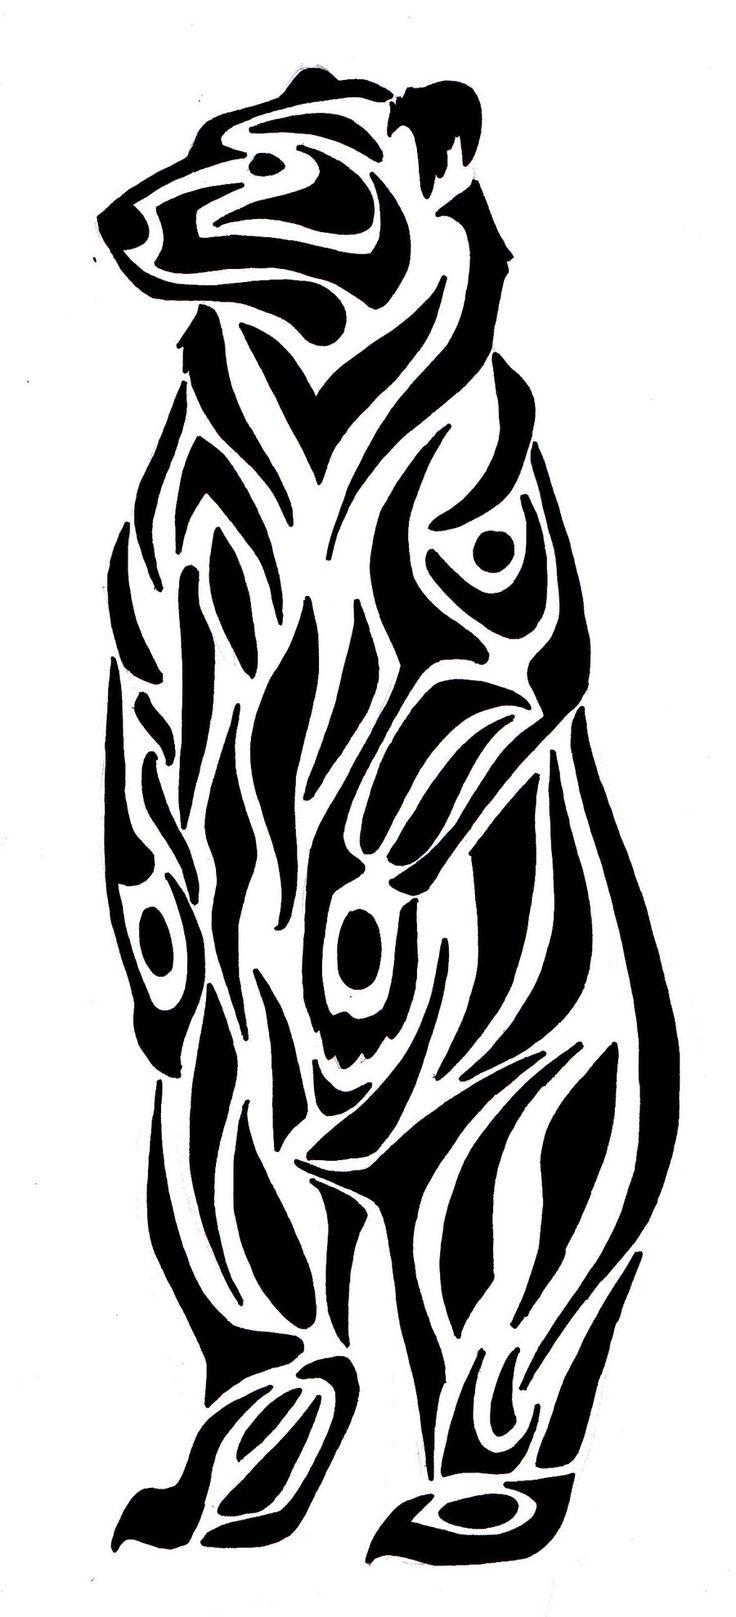 736x1617 Native American Drawings Of Bears